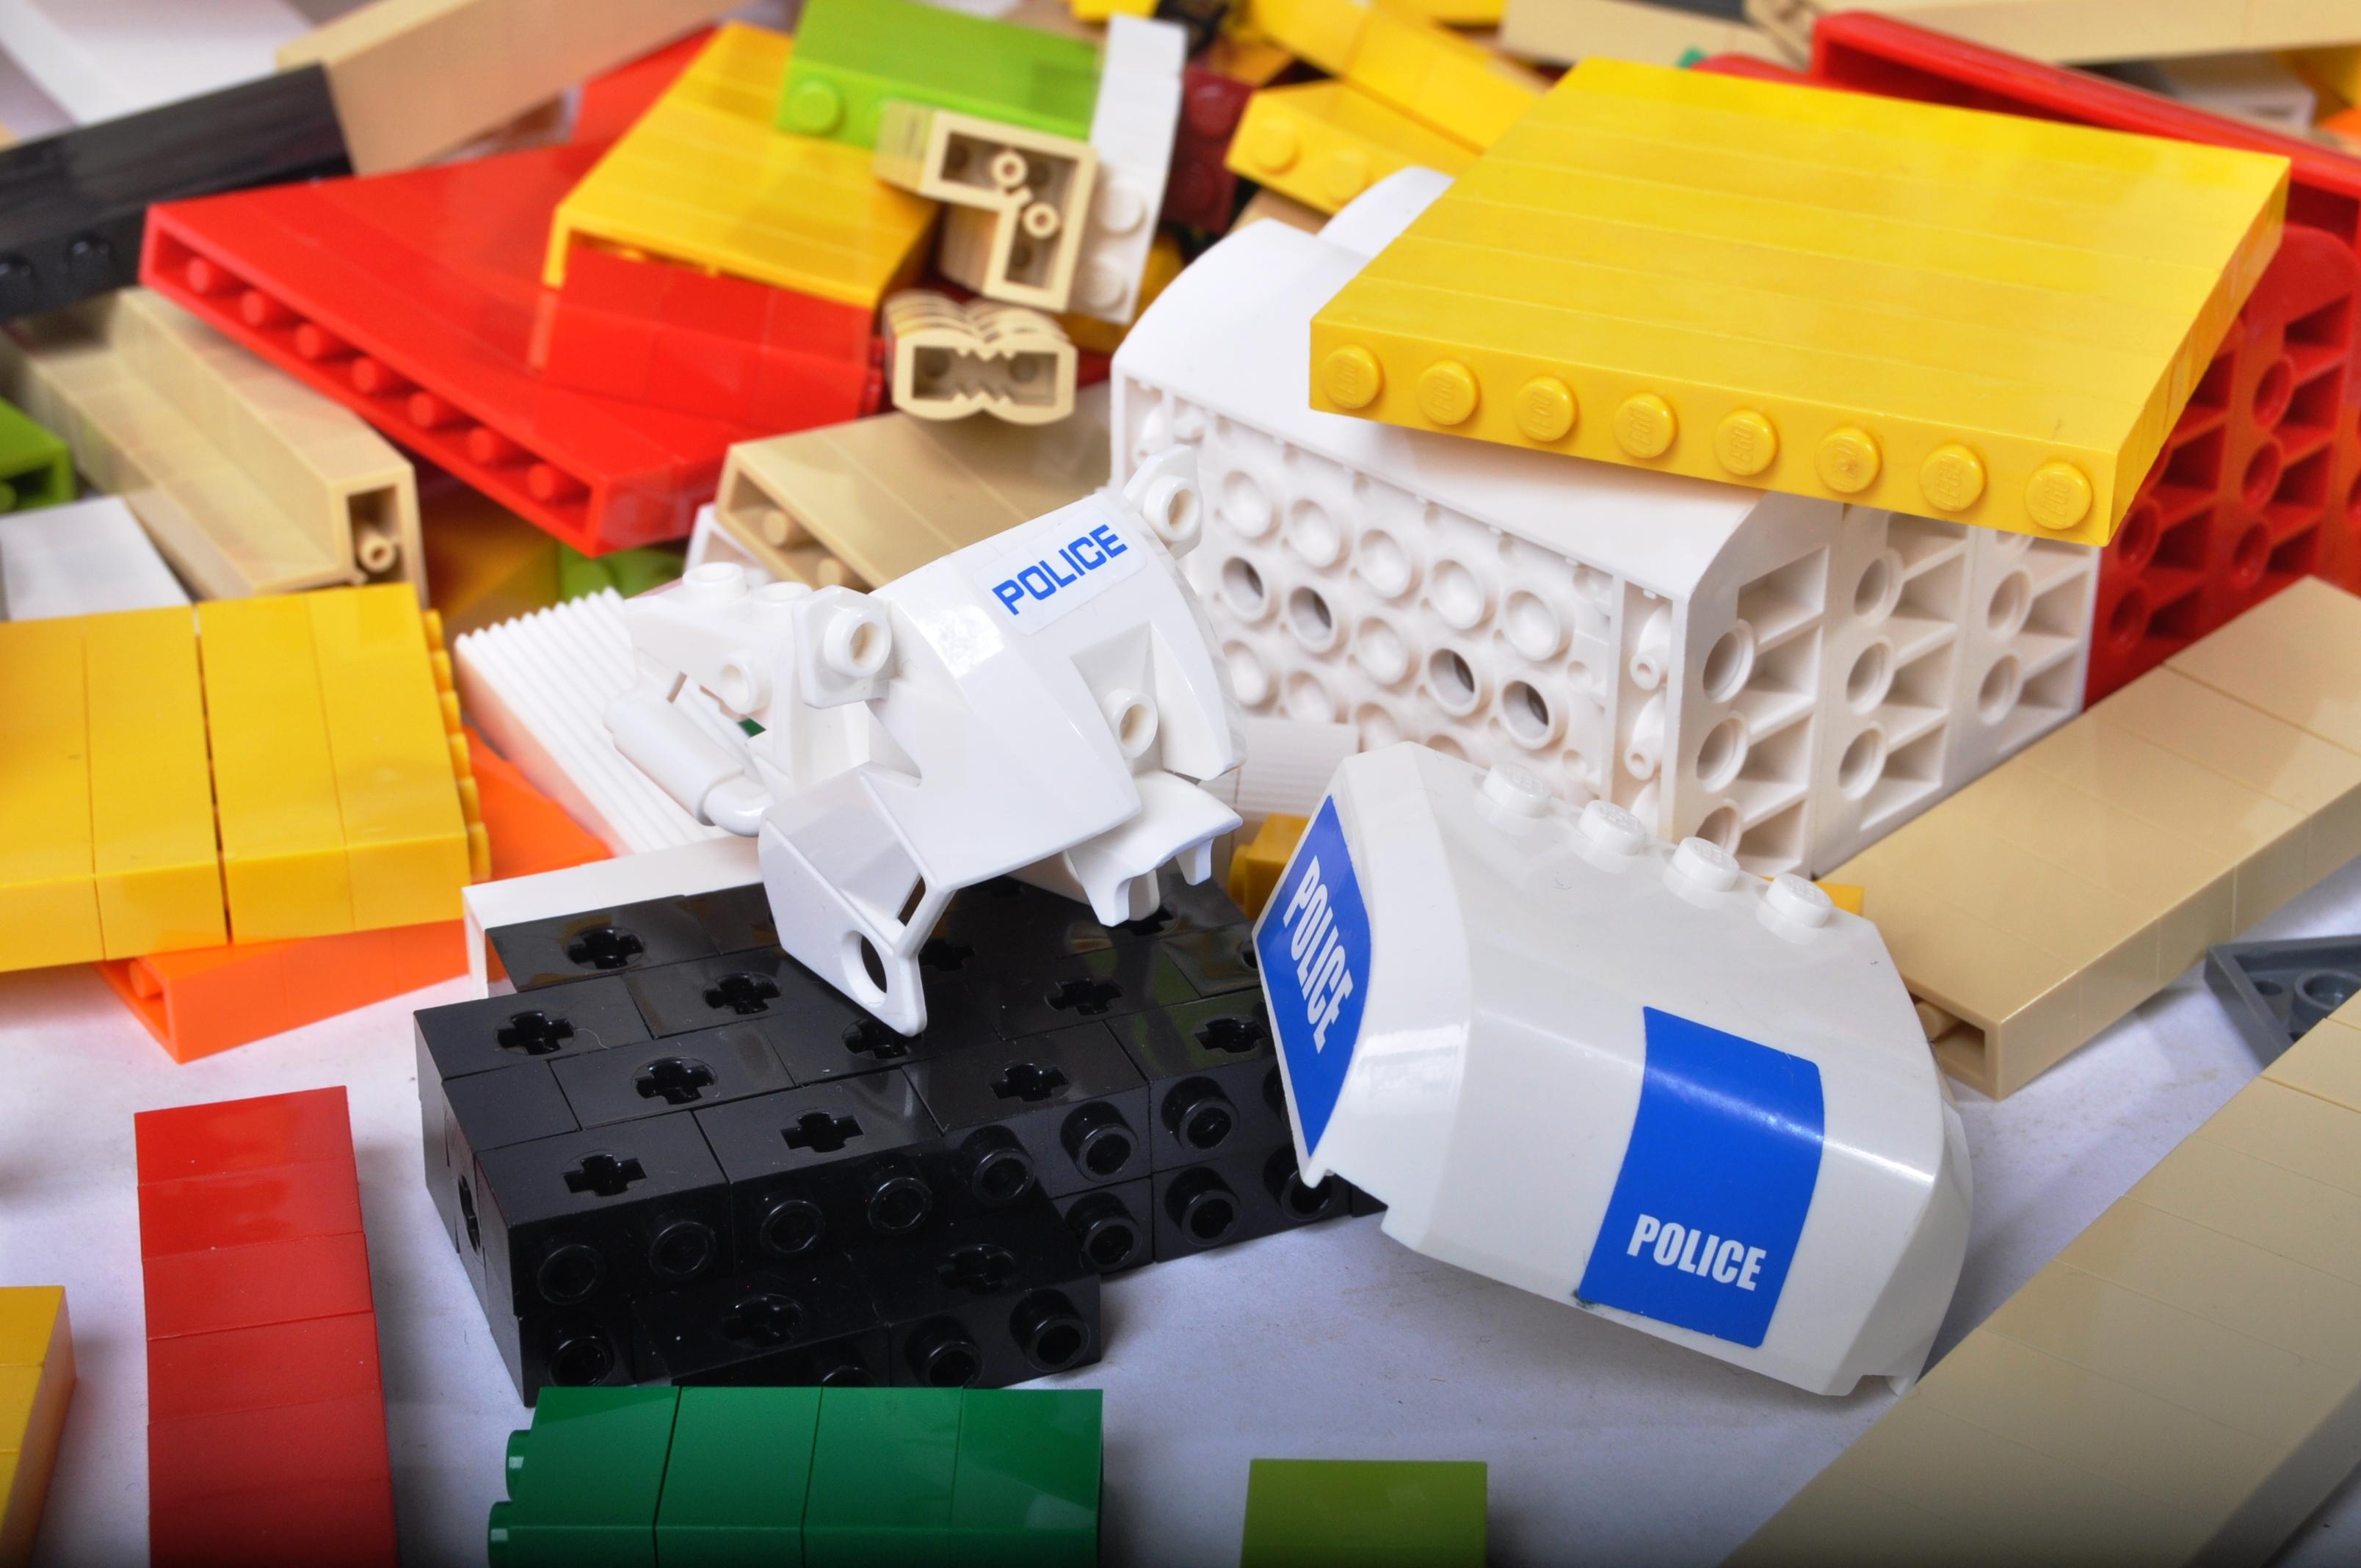 LARGE QUANTITY OF ASSORTED LOOSE LEGO BRICKS - Image 4 of 5